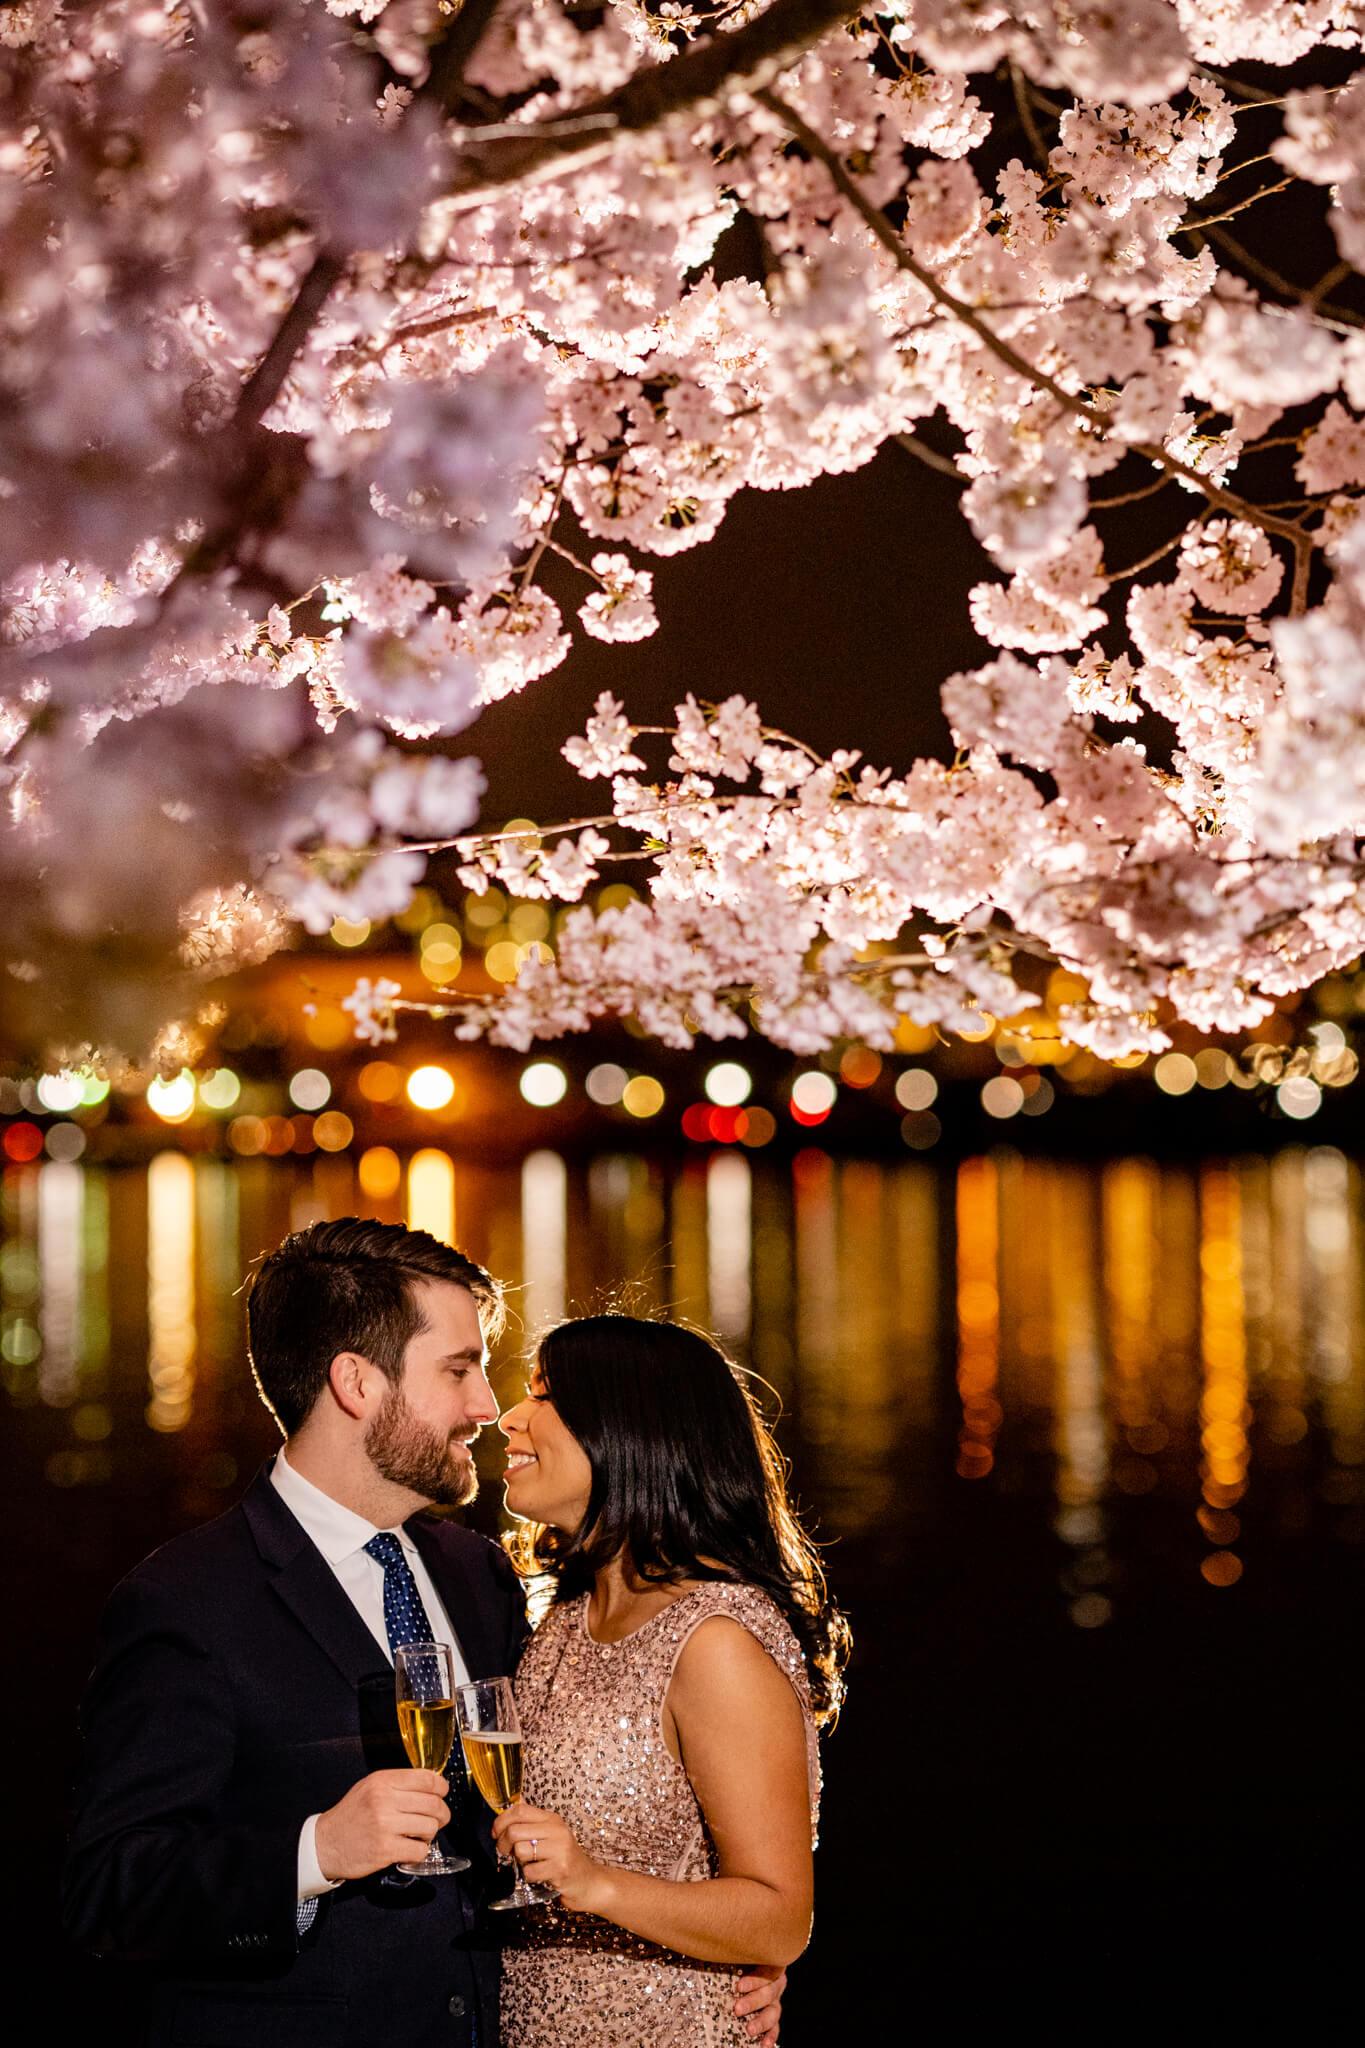 Danielle Michael DC Cherry Blossom Engagement Tidal Basin Washington Monument Engaged NYE Wedding Inspiration-10.jpg